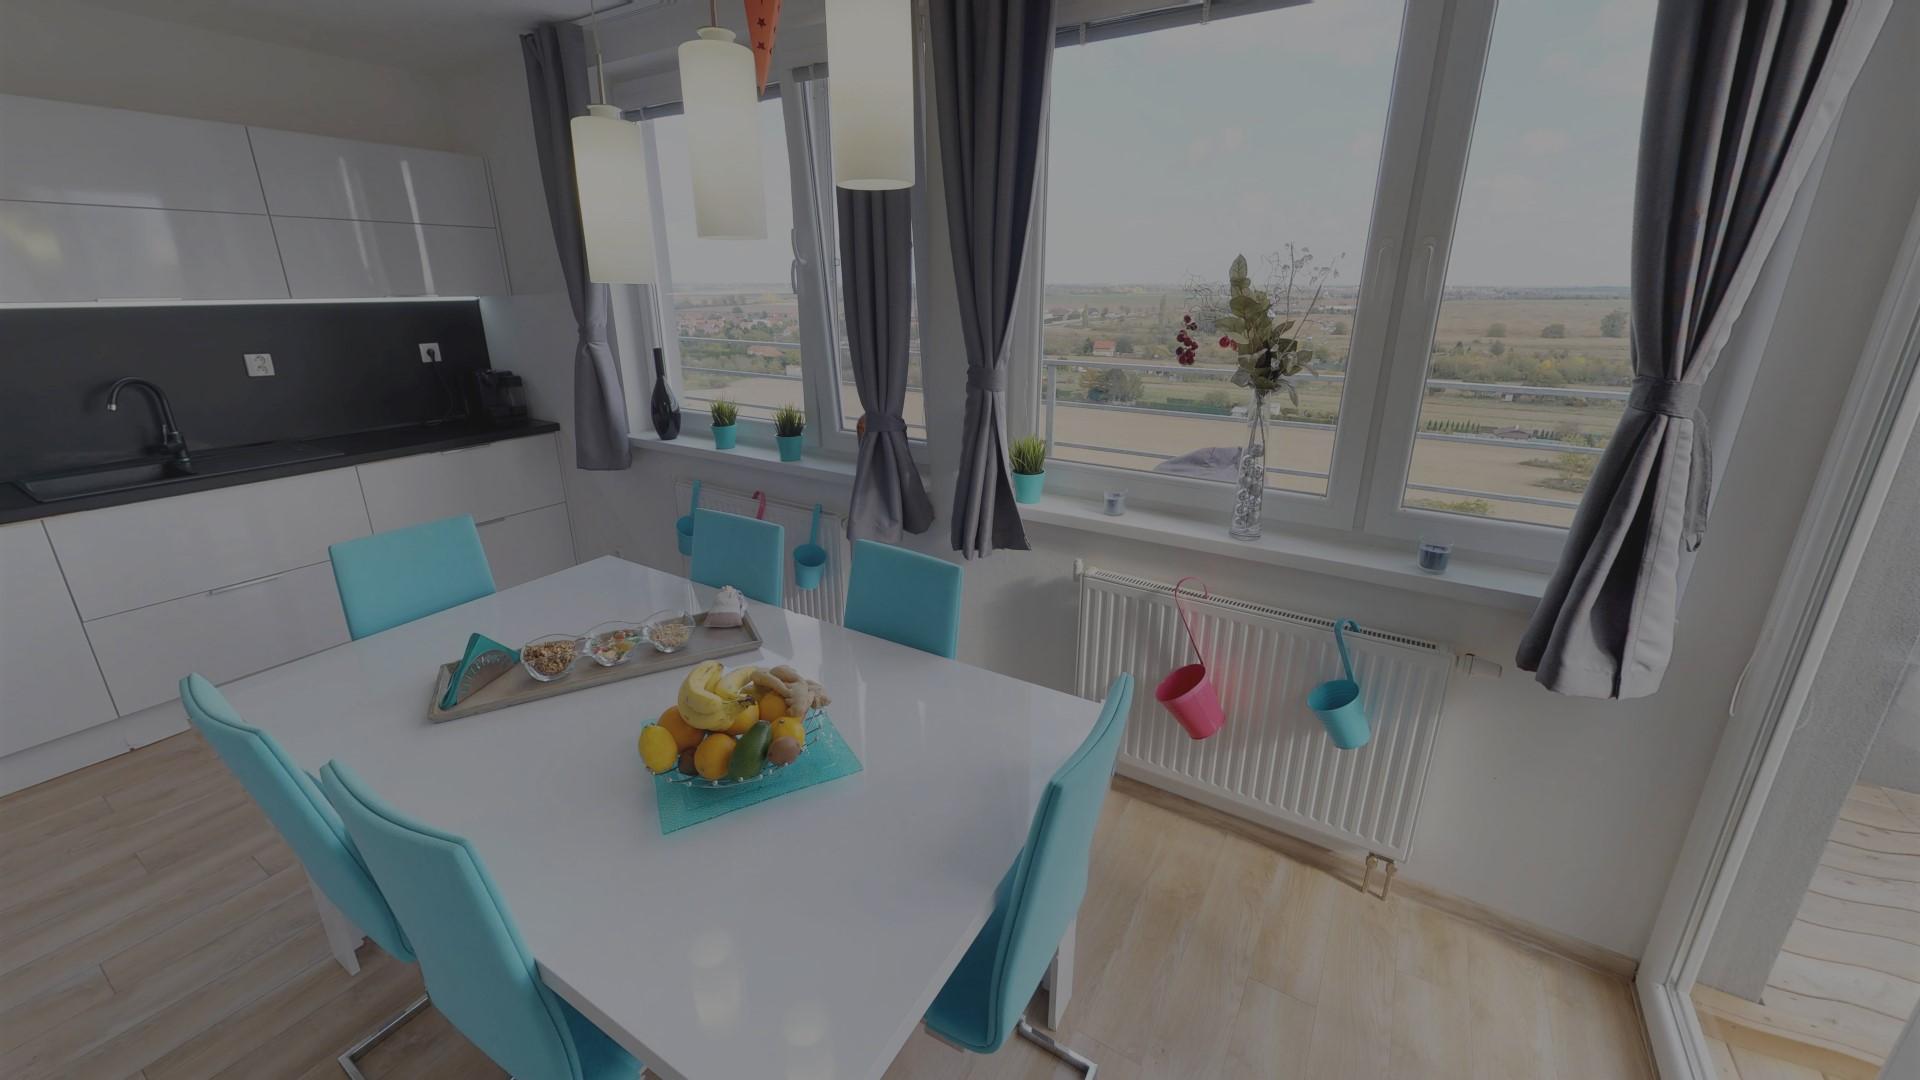 Virtuálna prehliadka-byt-bratislava-matterport-stôl-kuchyňa-3D-panora